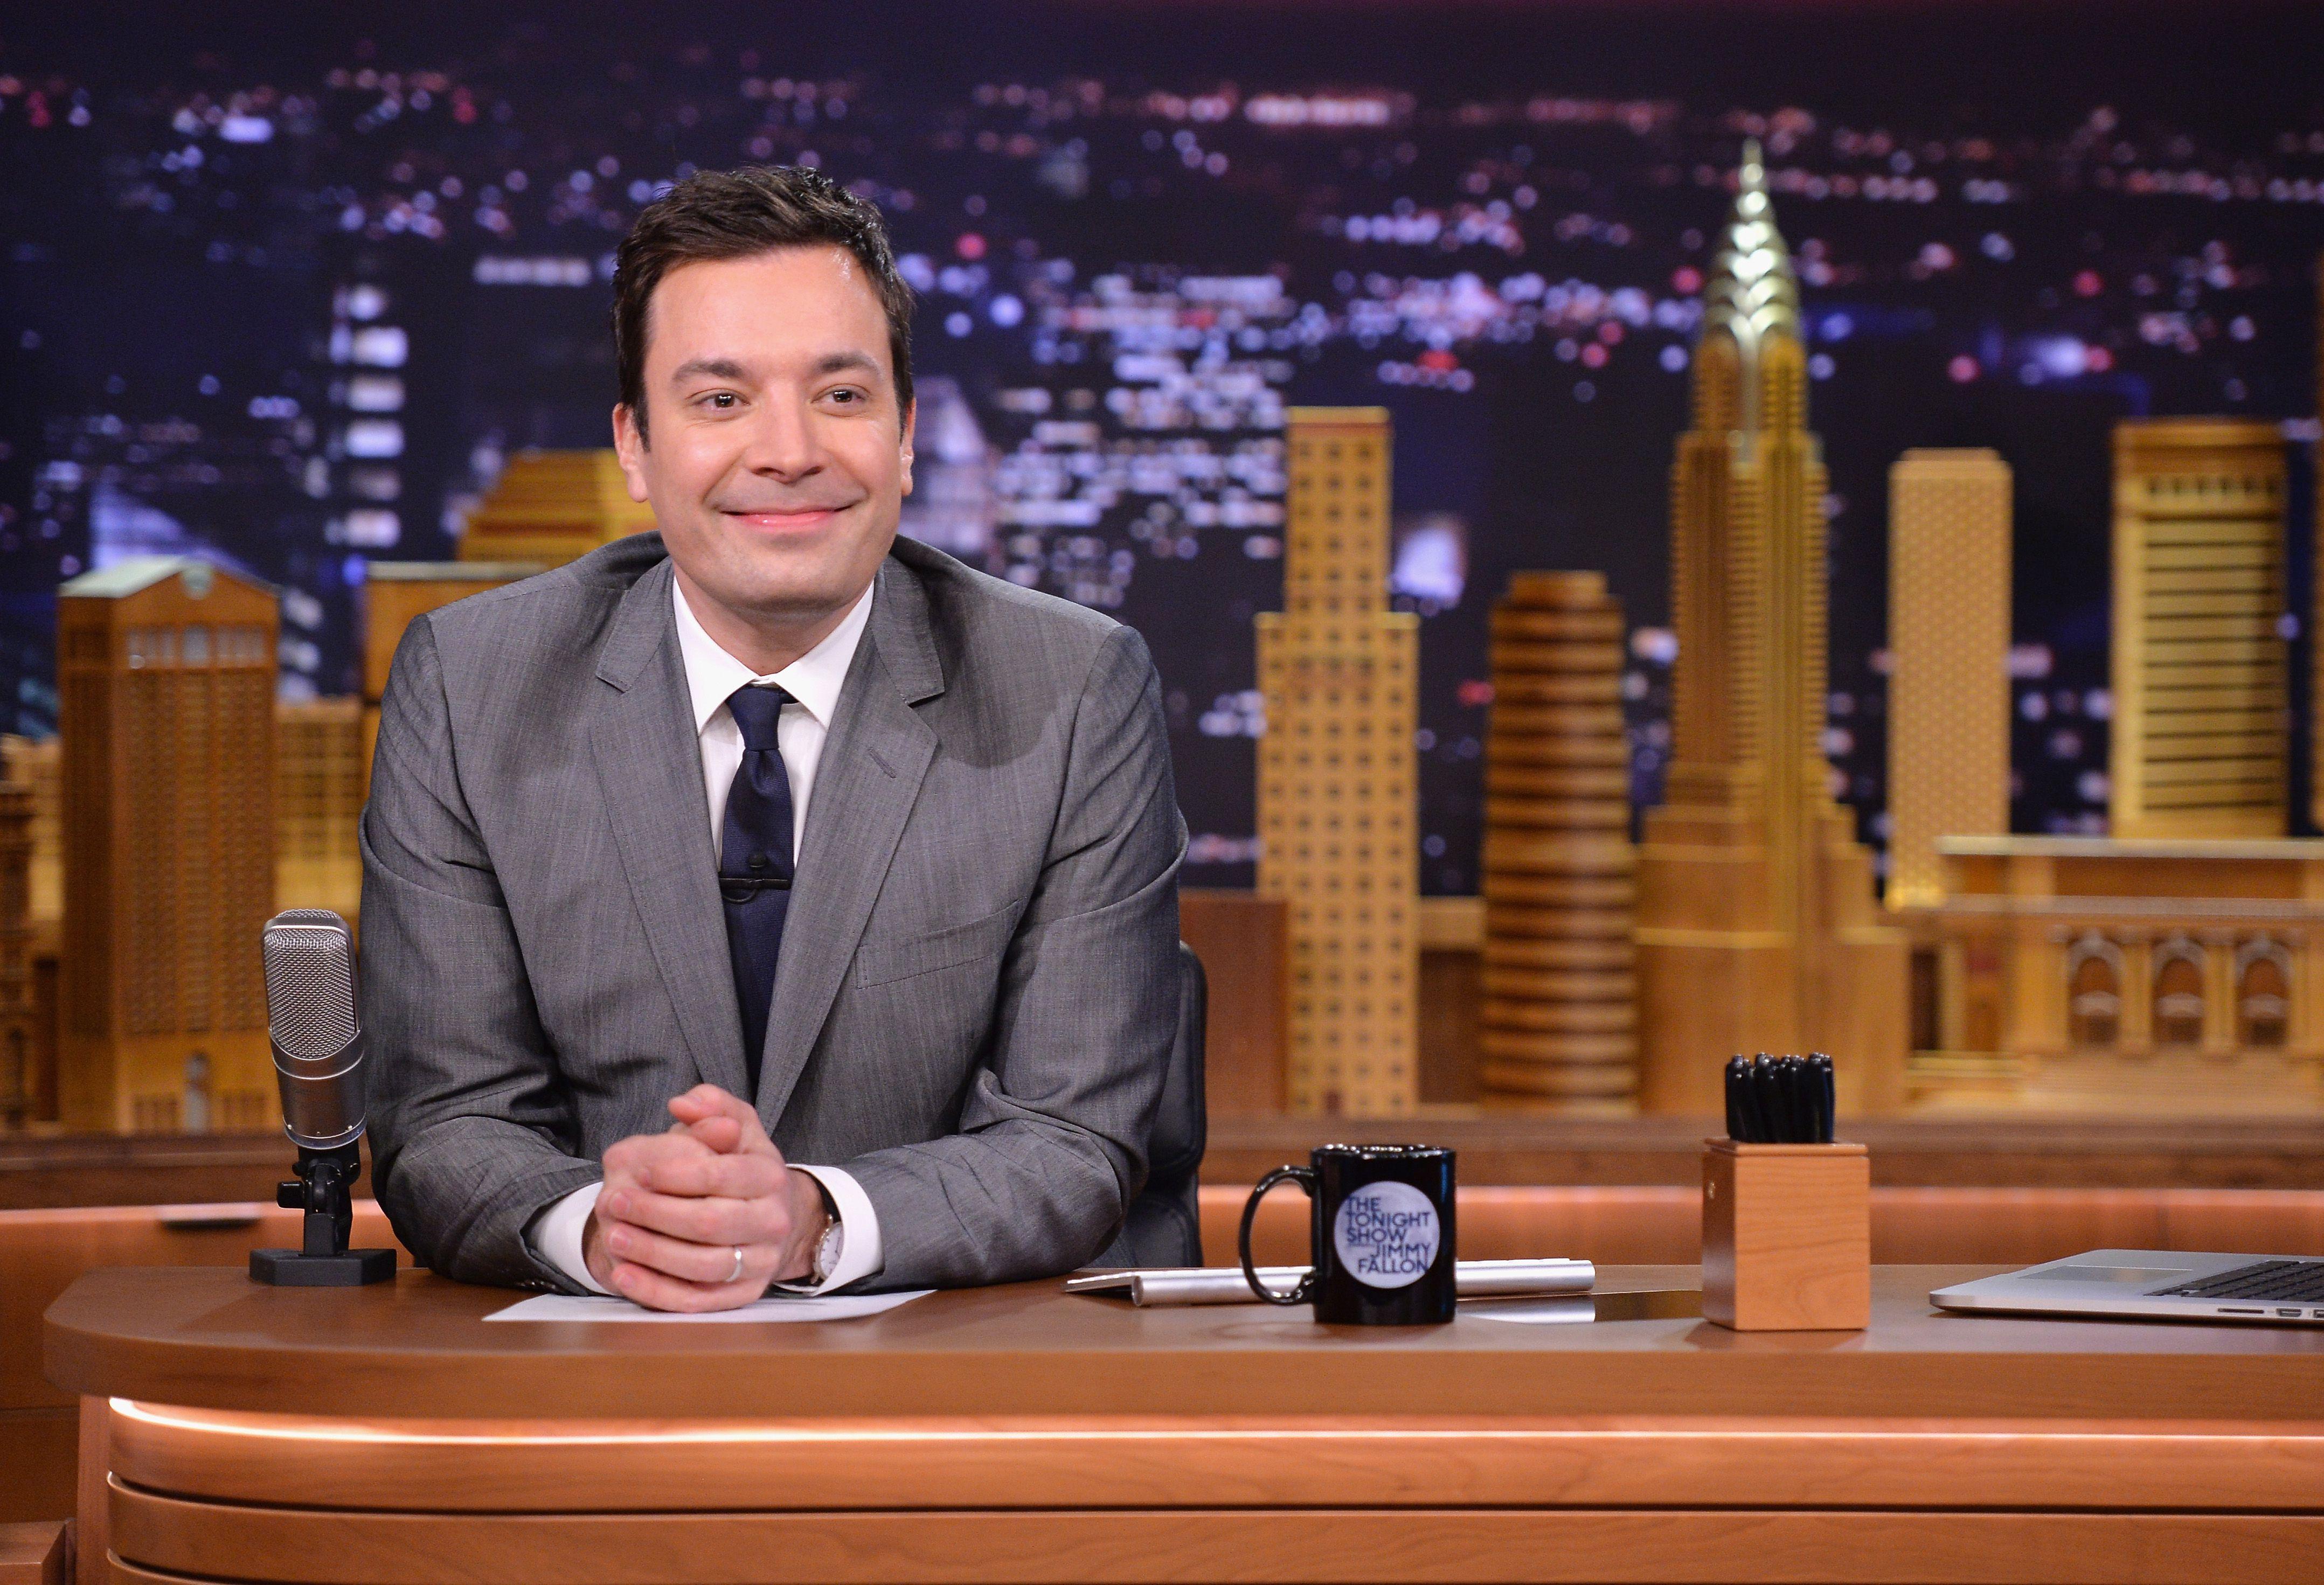 Drew Barrymore & Adam Sandler Visit 'The Tonight Show Starring Jimmy Fallon'